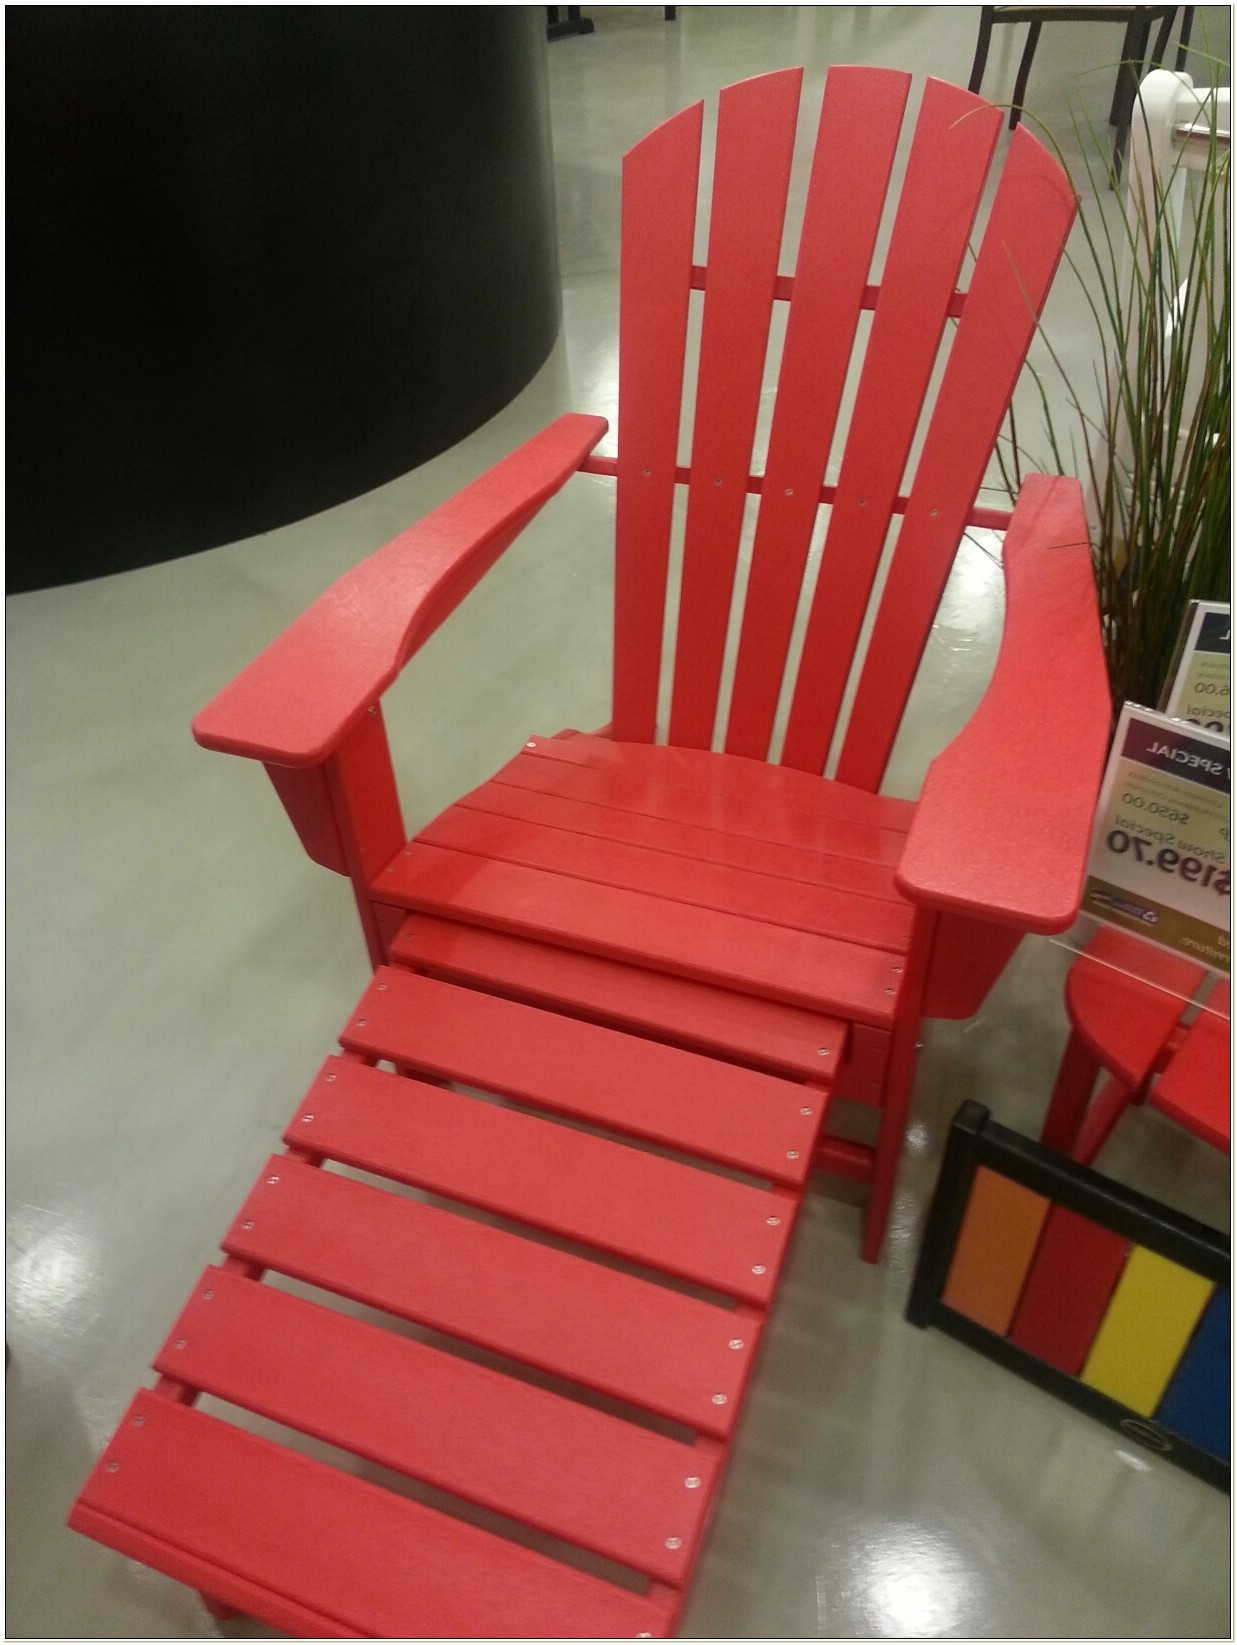 Polywood Adirondack Chairs With Ottoman